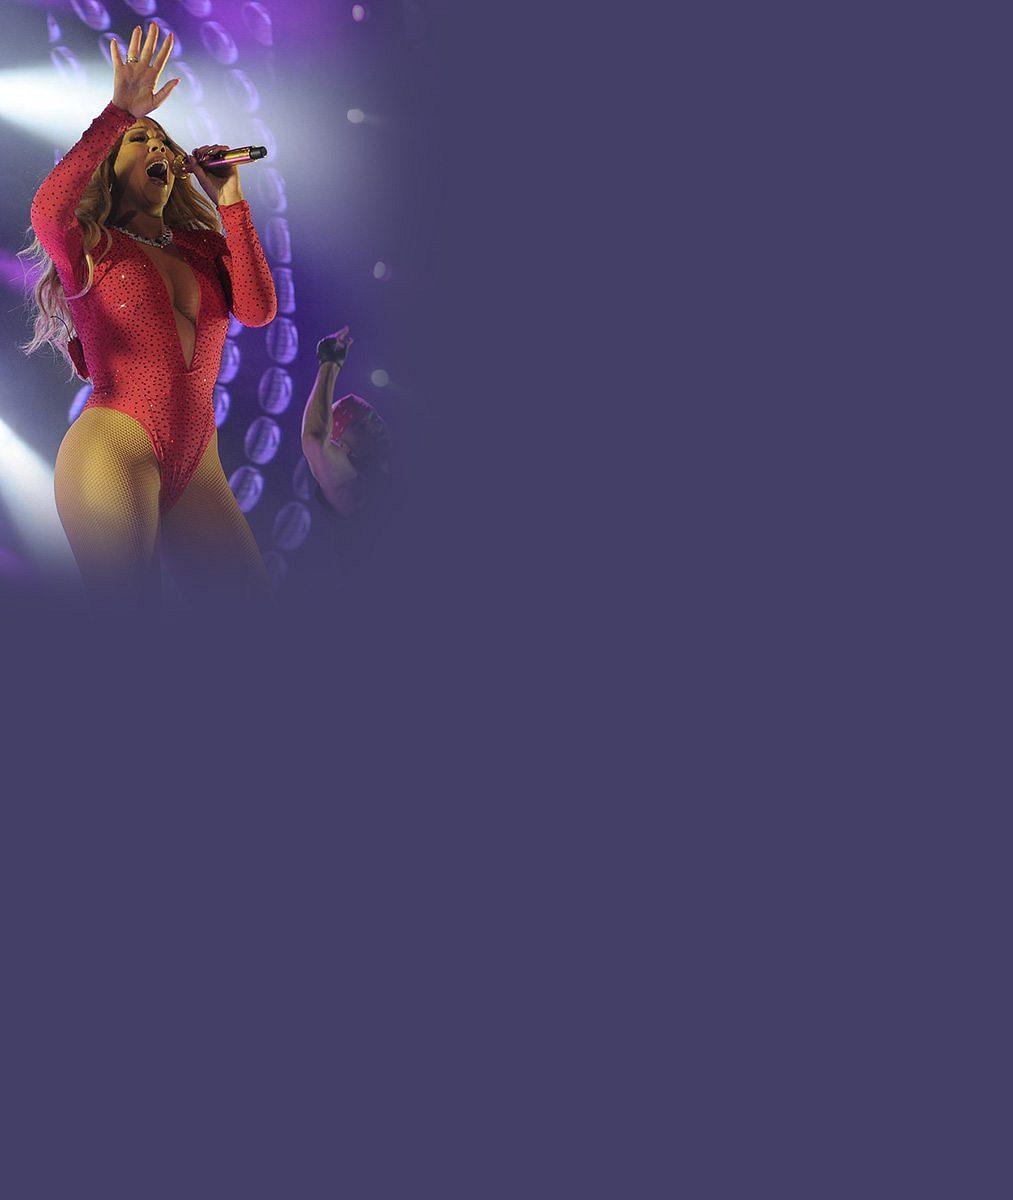 Výstřih a tanga: Mariah Carey na koncertě v Mexiku exsnoubenci ukázala, oč přišel!